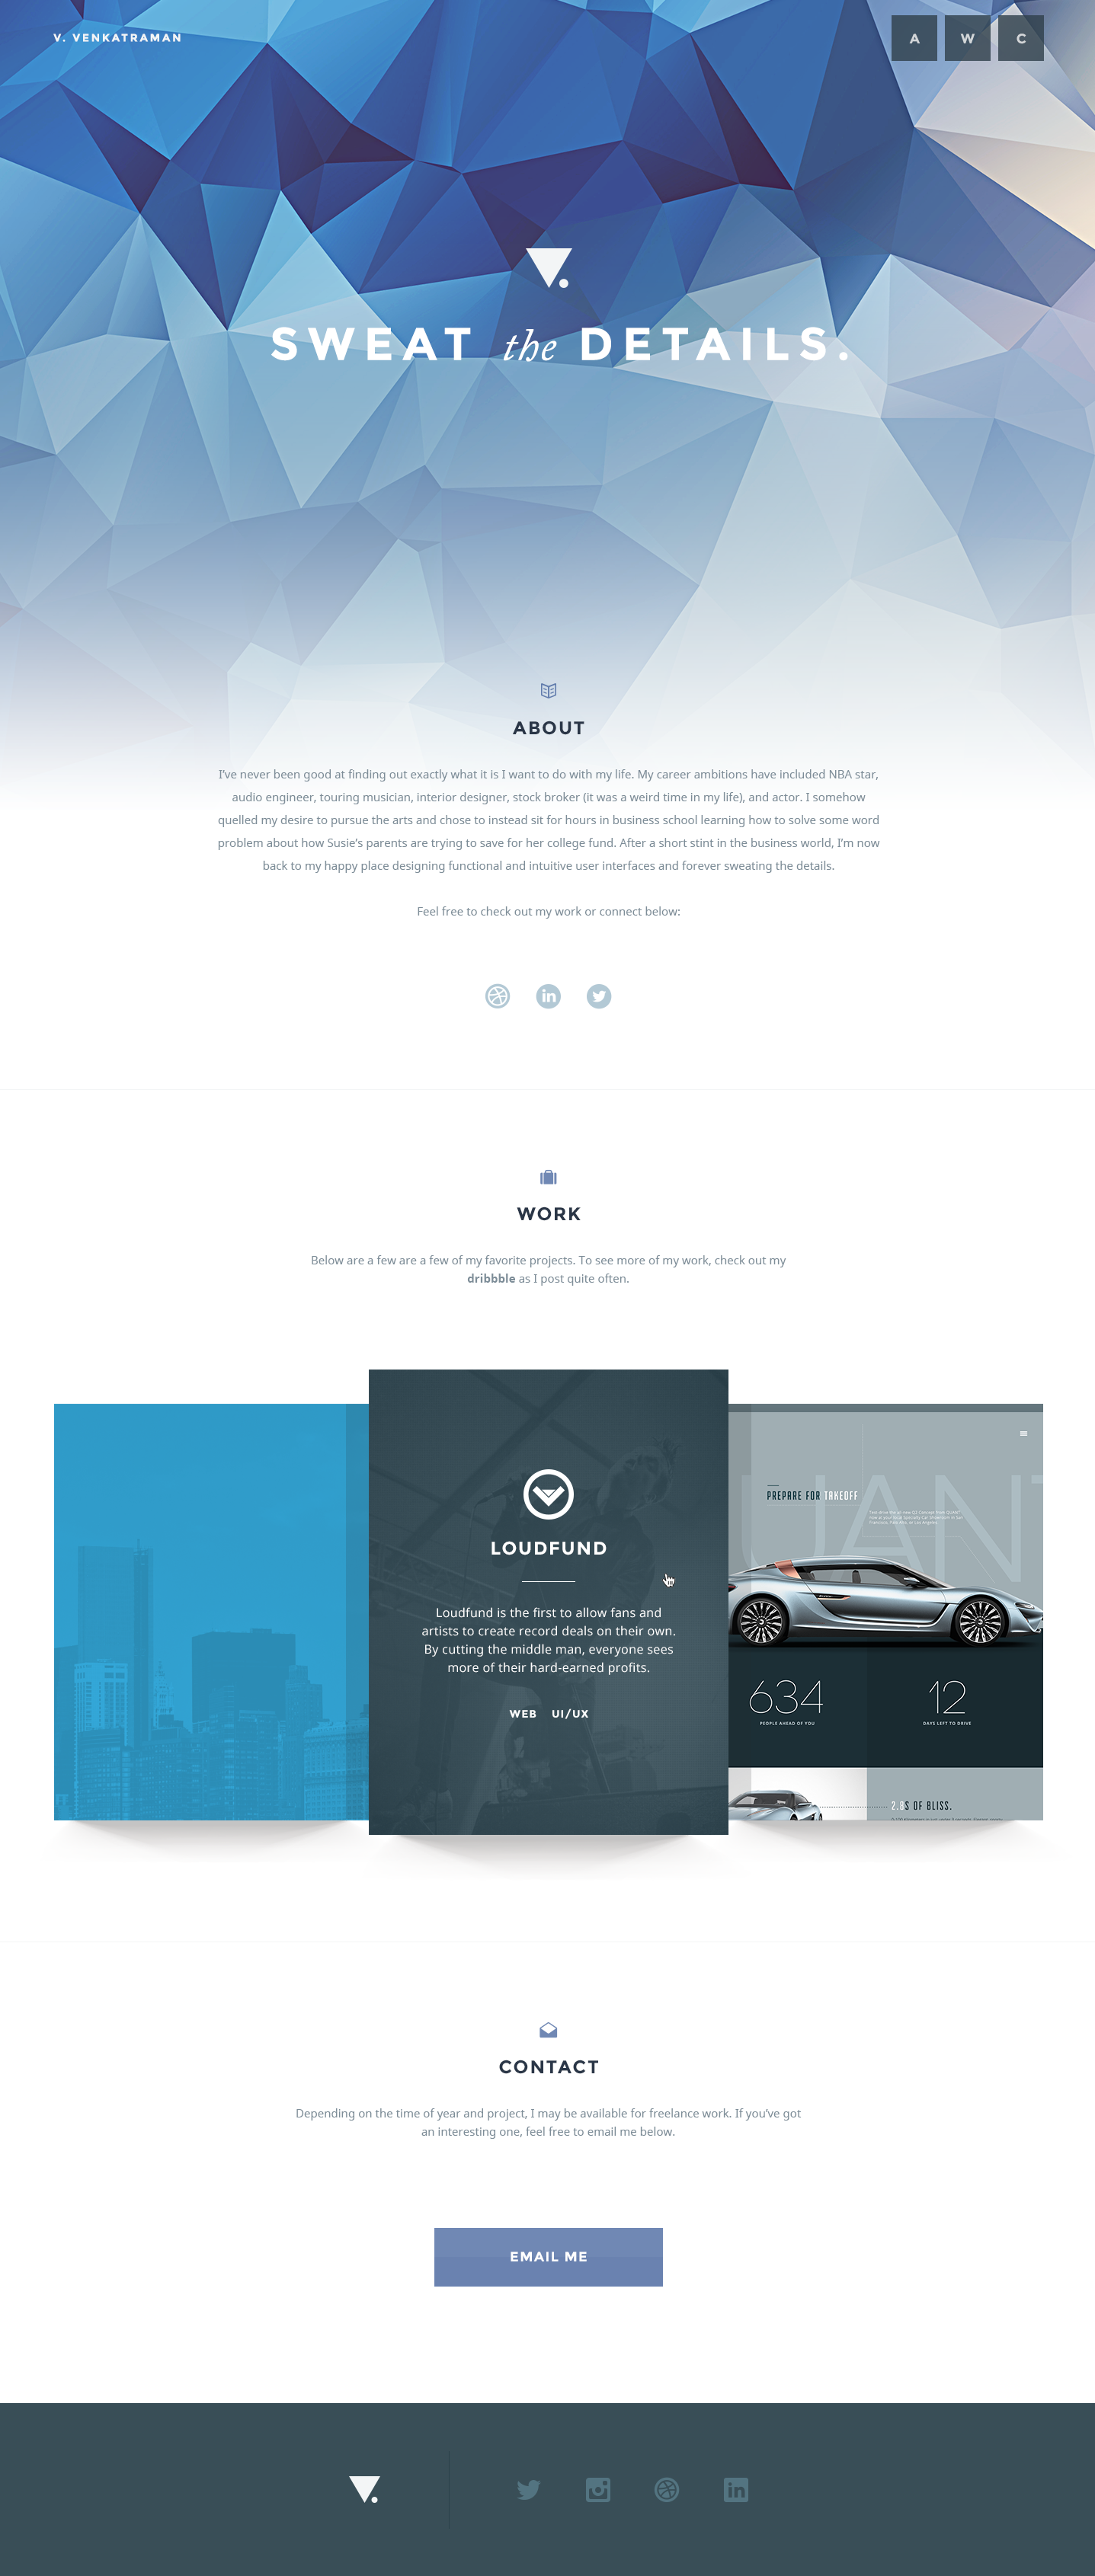 Simple One Page Personal Website Design Personalwebsitedesign Searchengineoptimizationwebsitedesign Personal Website Design Homepage Design Web Design Quotes